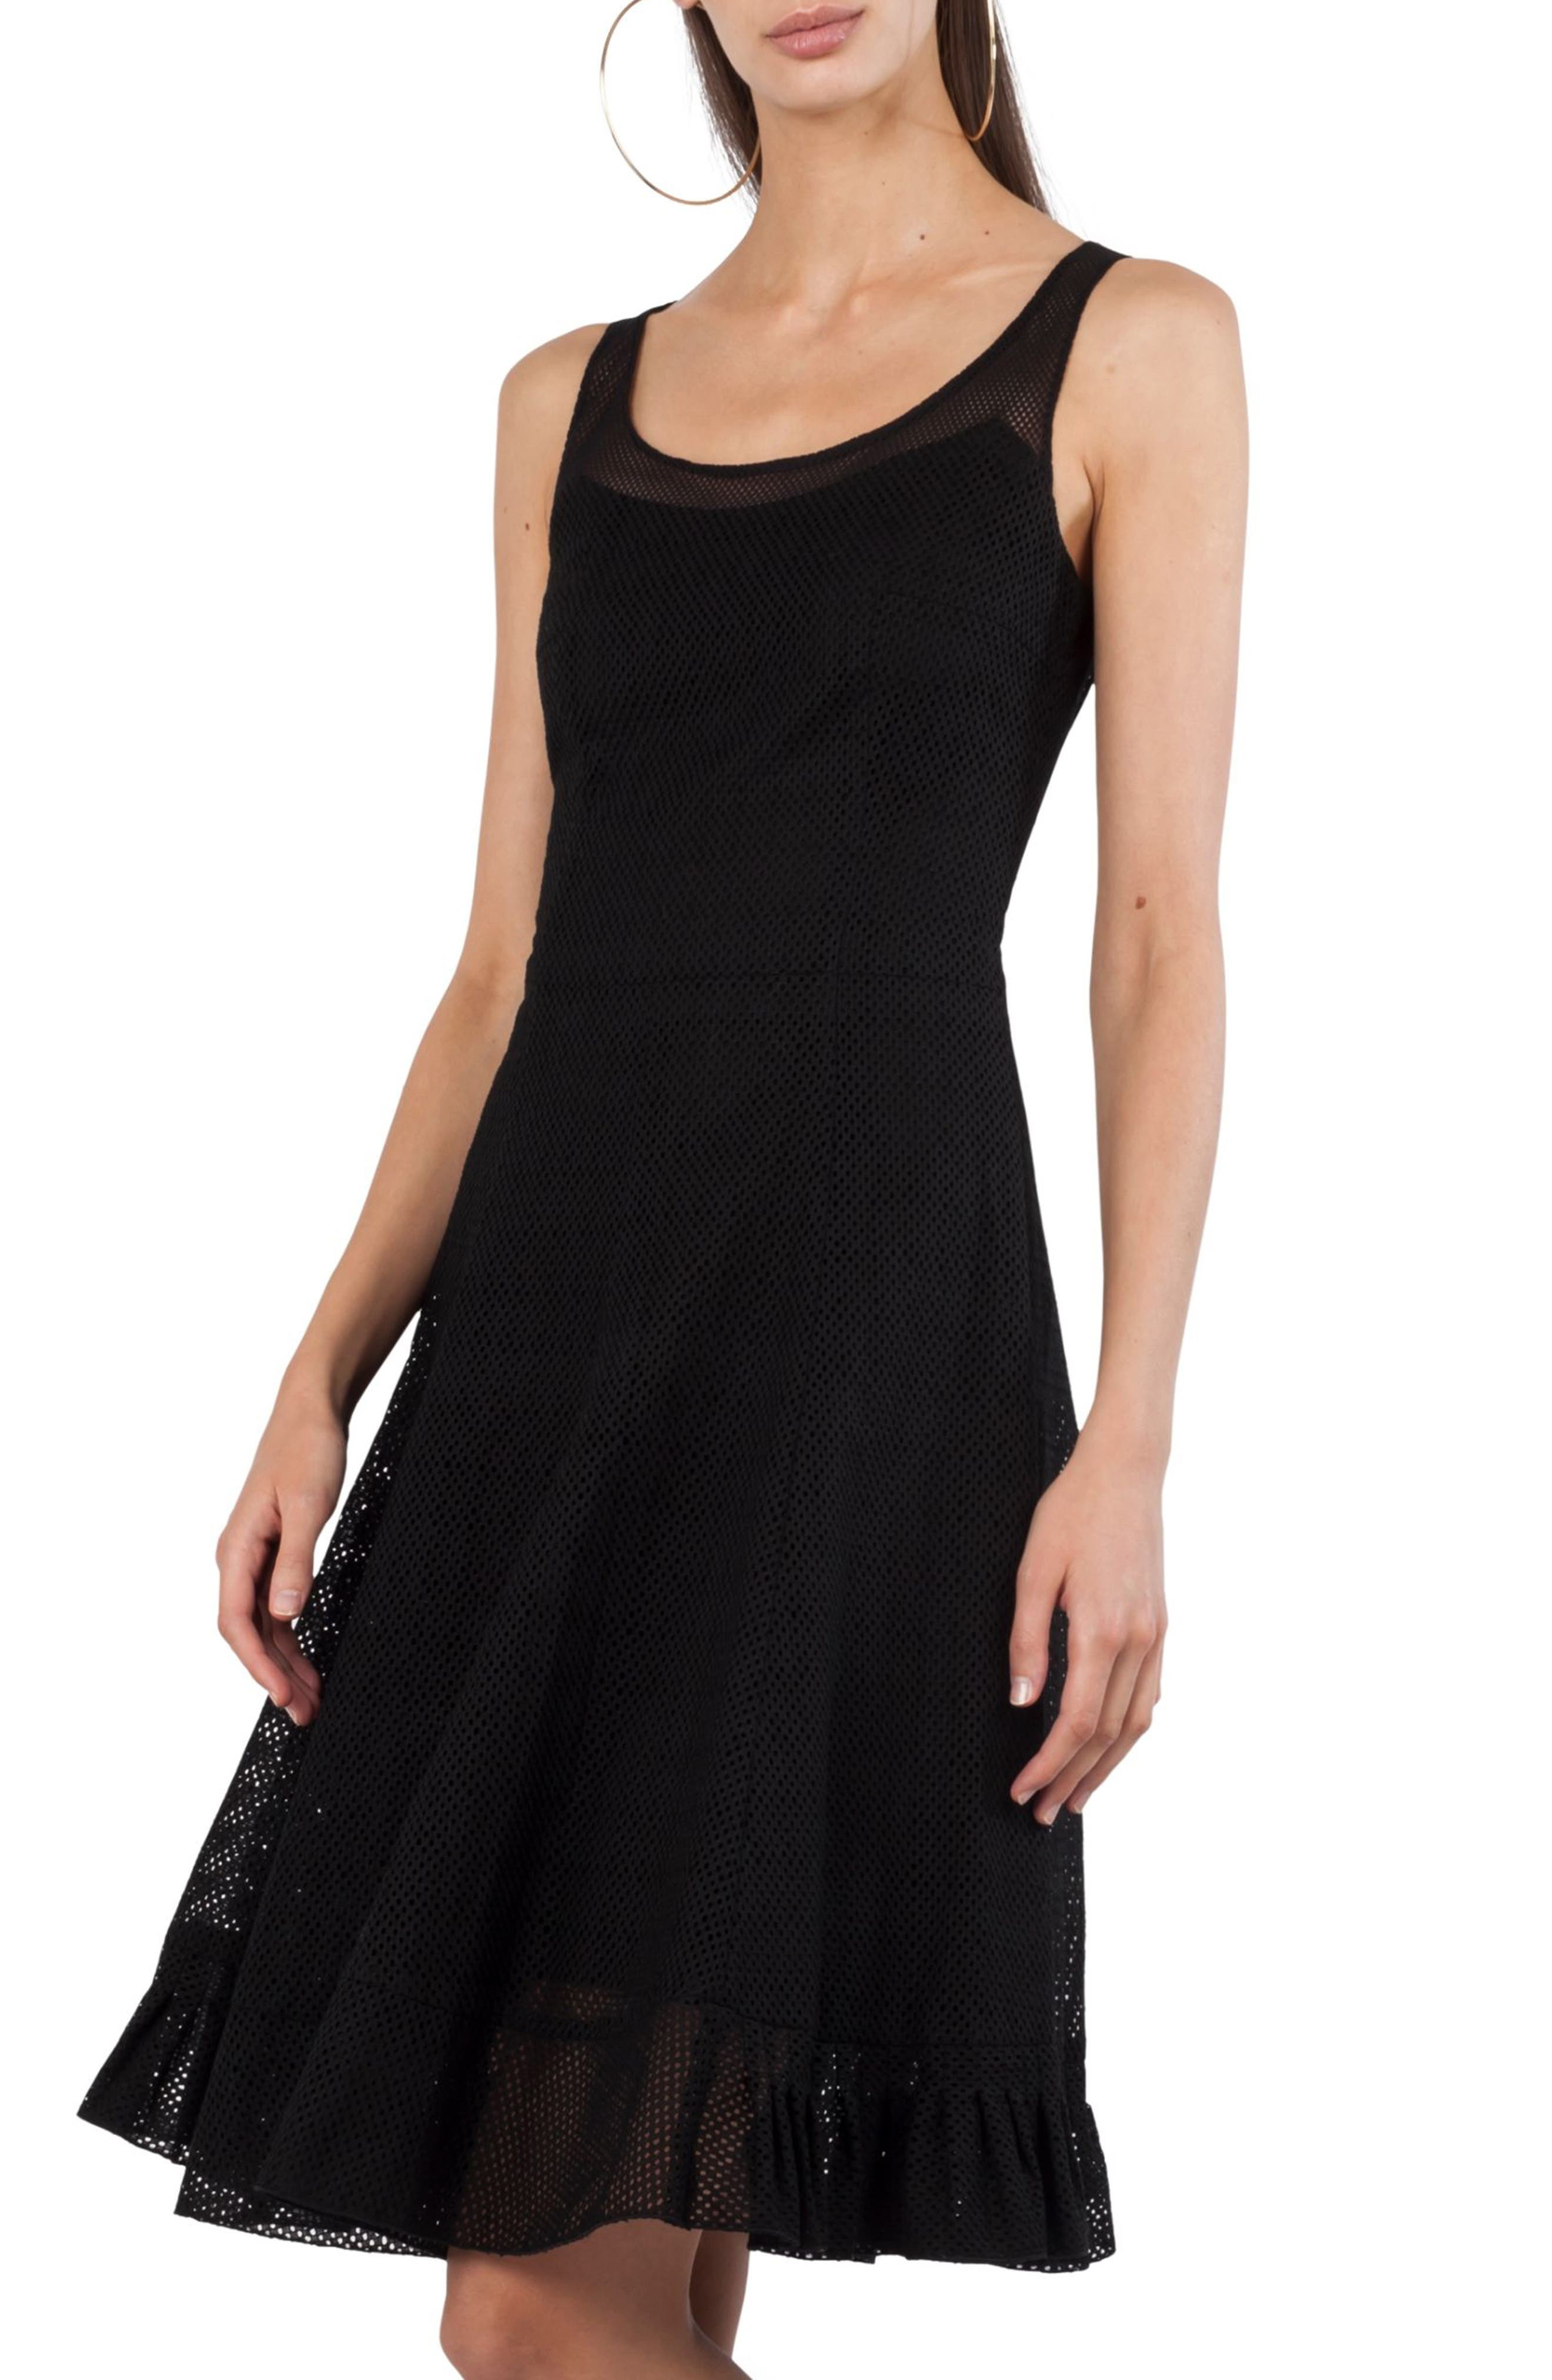 Perforated Tank Dress,                         Main,                         color, Black